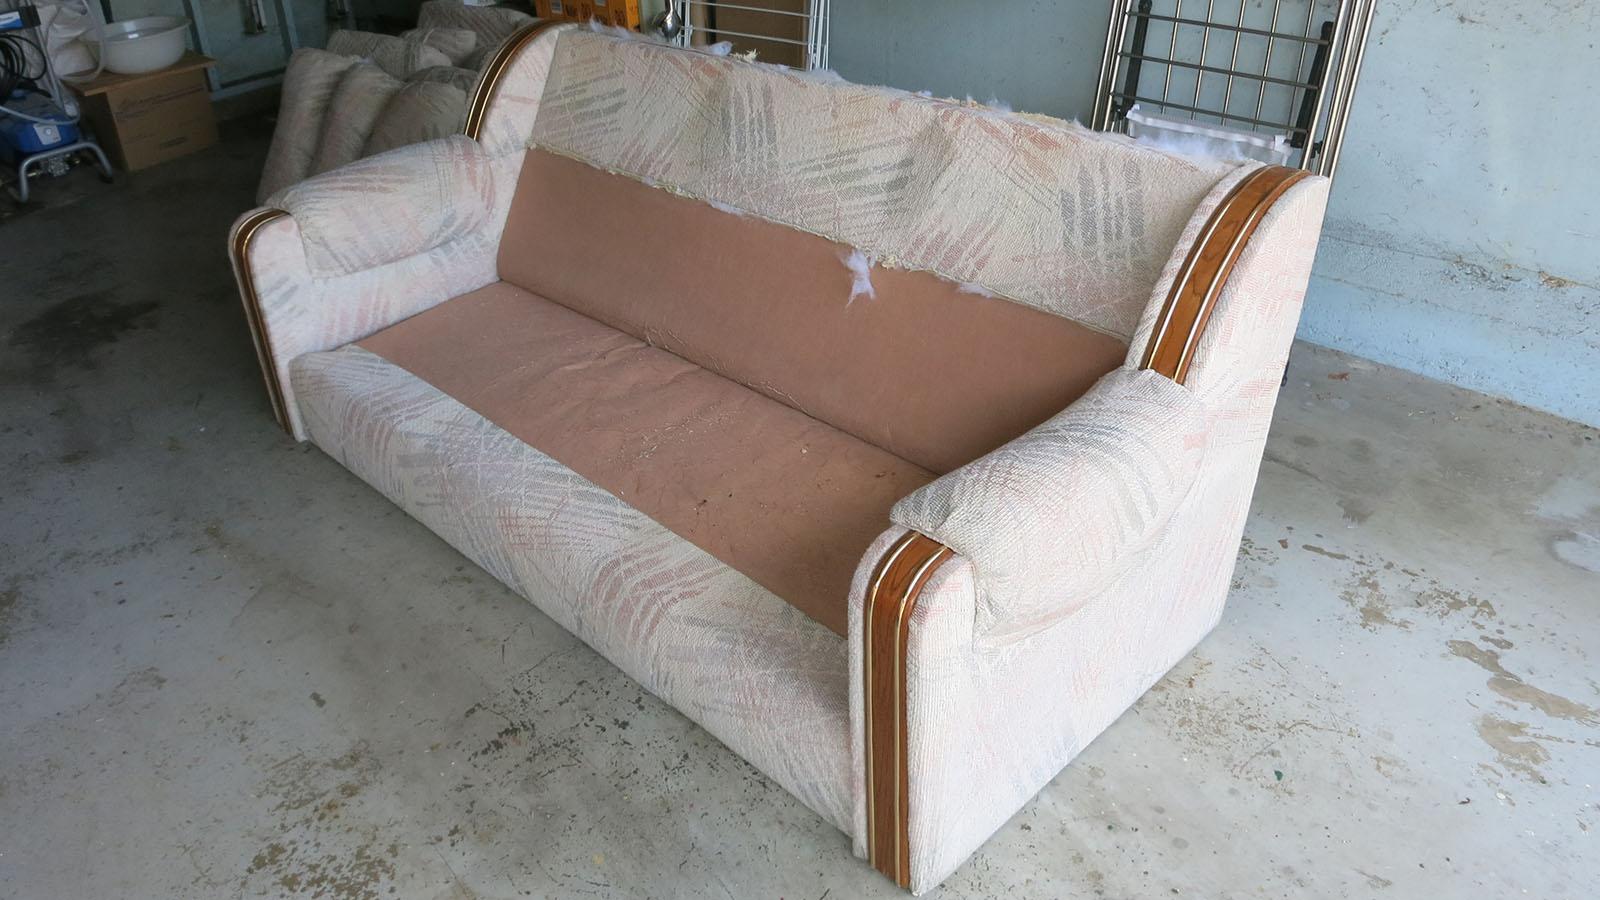 Couch Teardown 03 - back cushions cut off